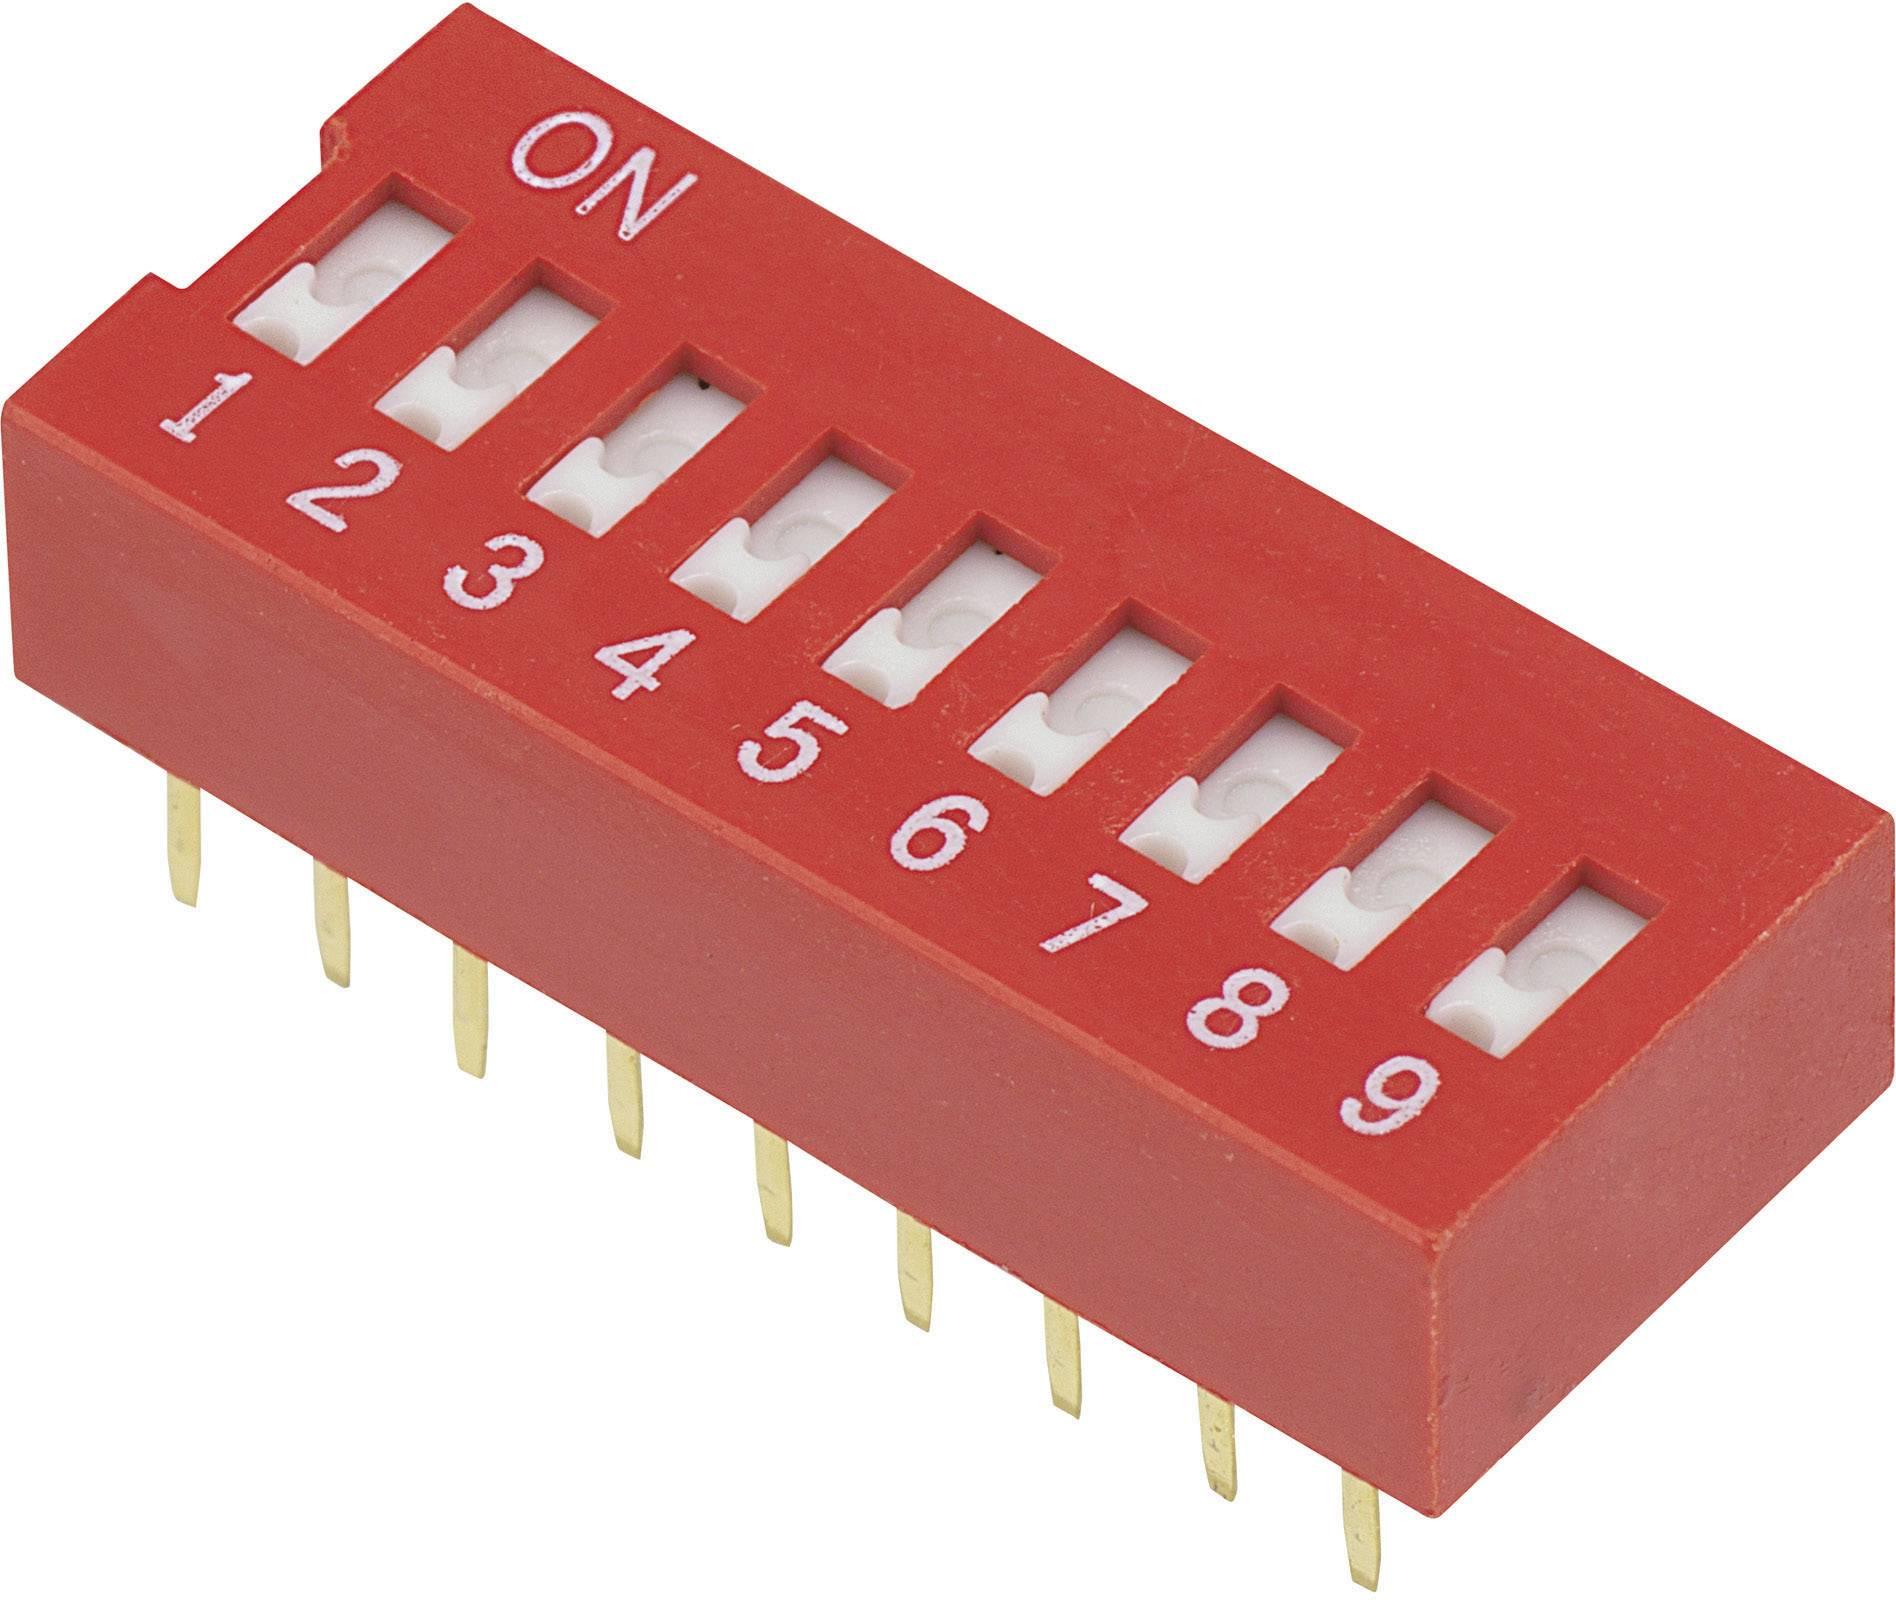 DIP spínač DSR-09, (š x v) 9,9 mm x 5,7 mm